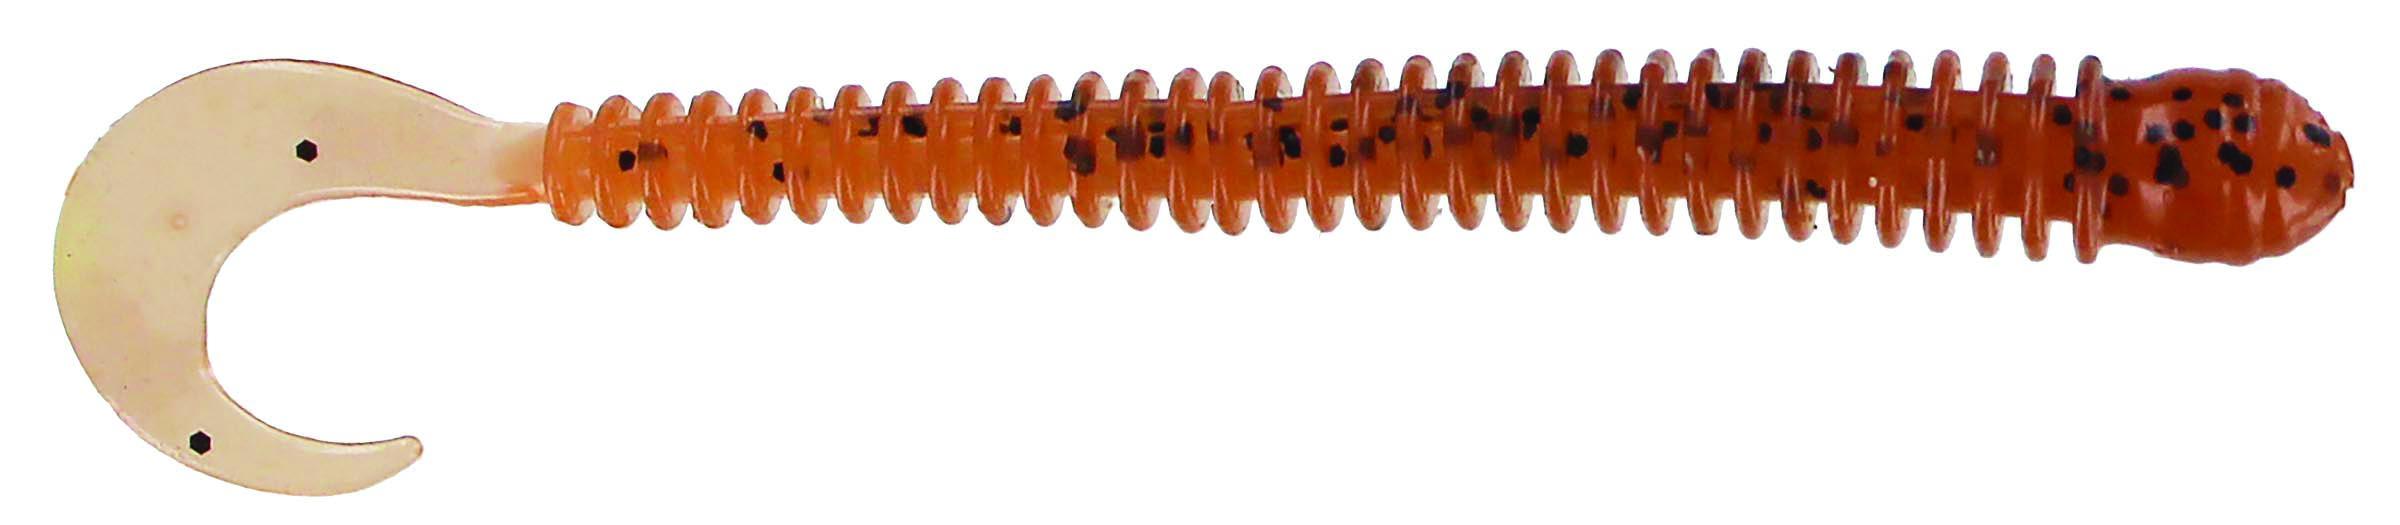 Big Bite Baits - Disc Ring Worm - 4 inch - RW-404 - PUMPKIN SEED